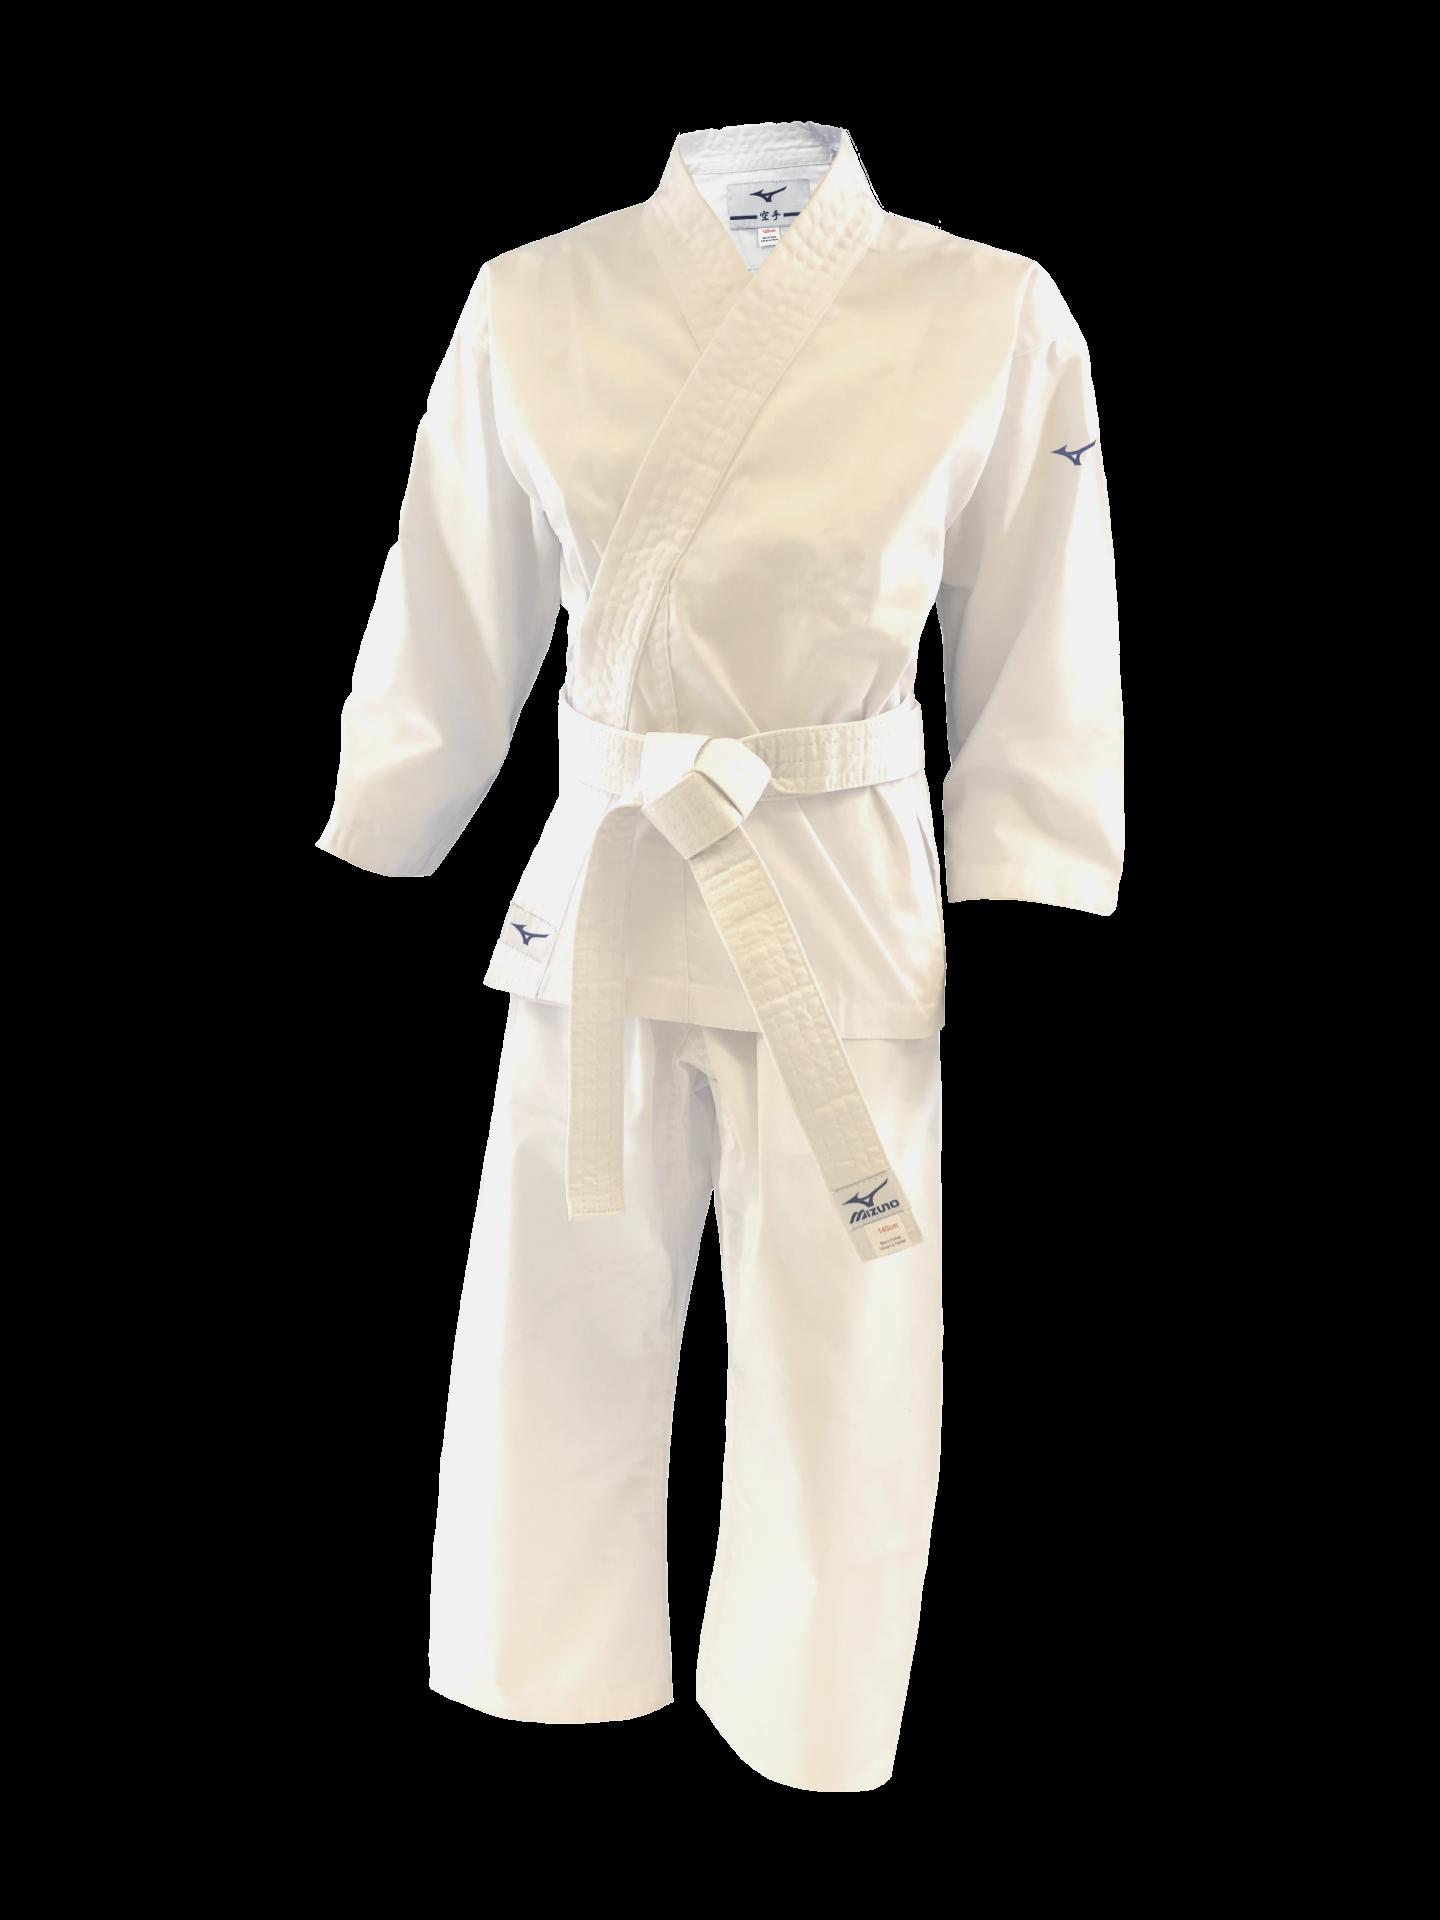 Kimono karate kiai